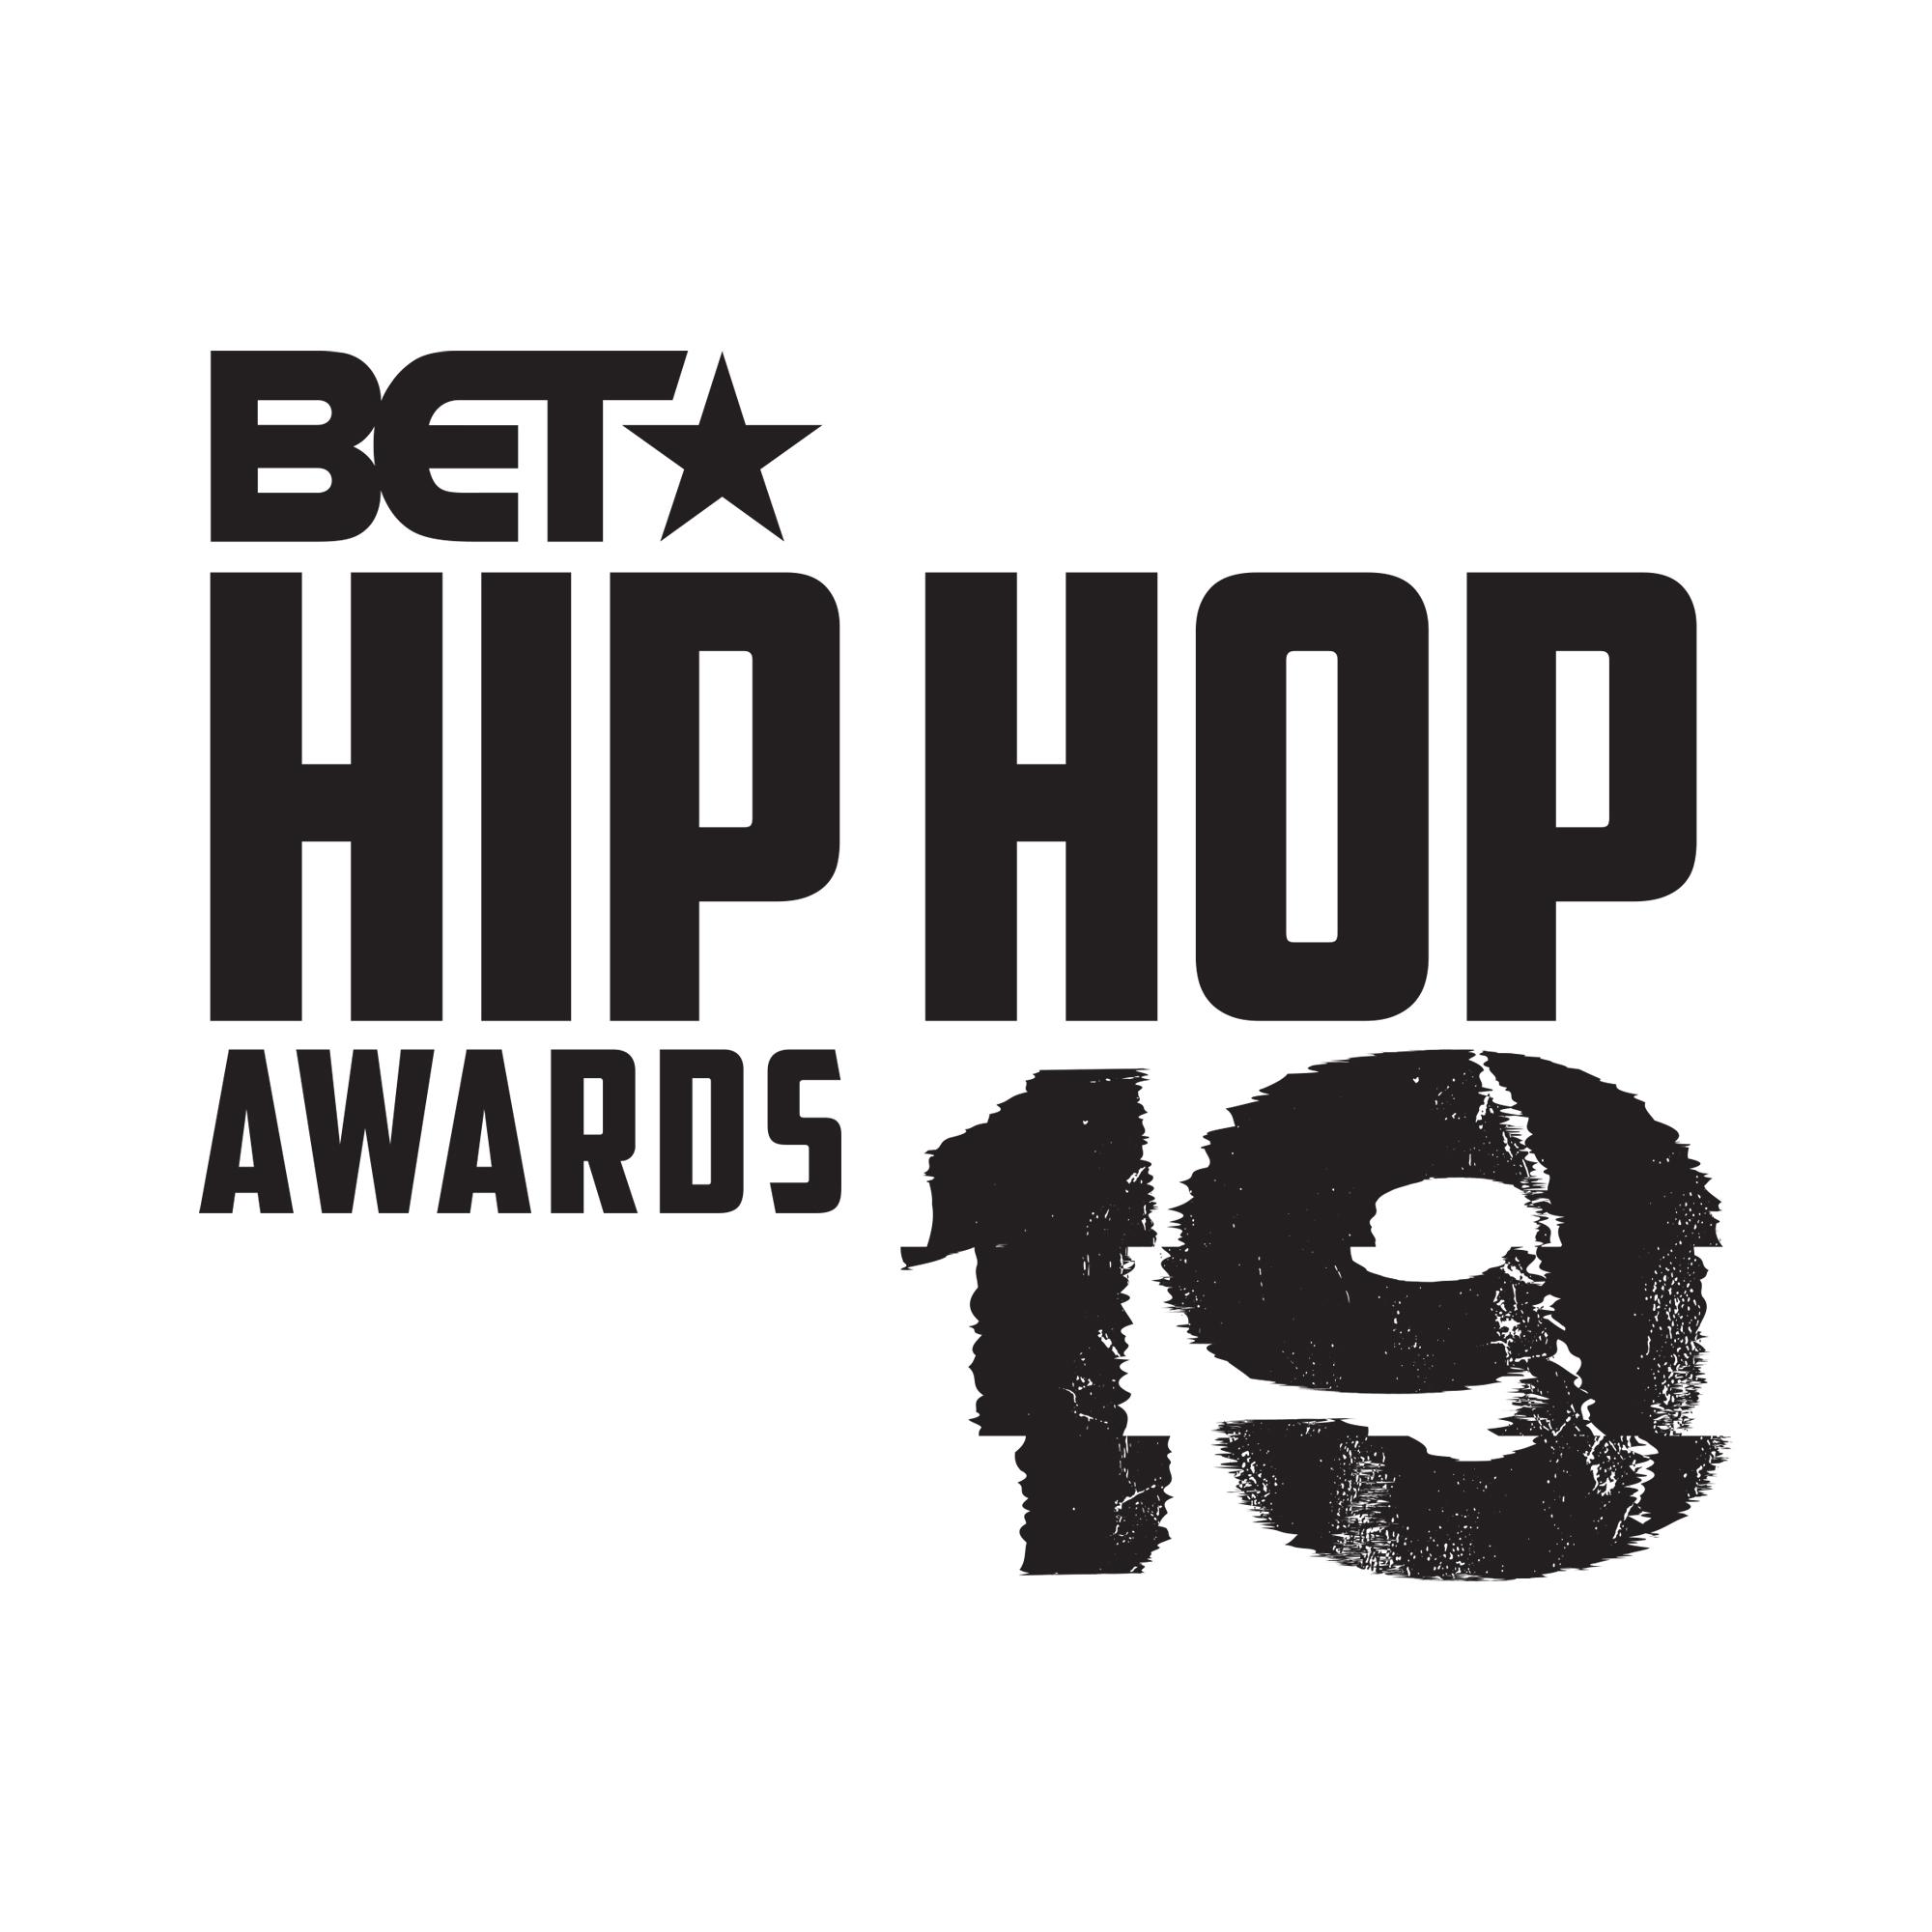 Bet Awards 2020 Full Show.2020 Bet Hip Hop Awards Full Show Show 2020